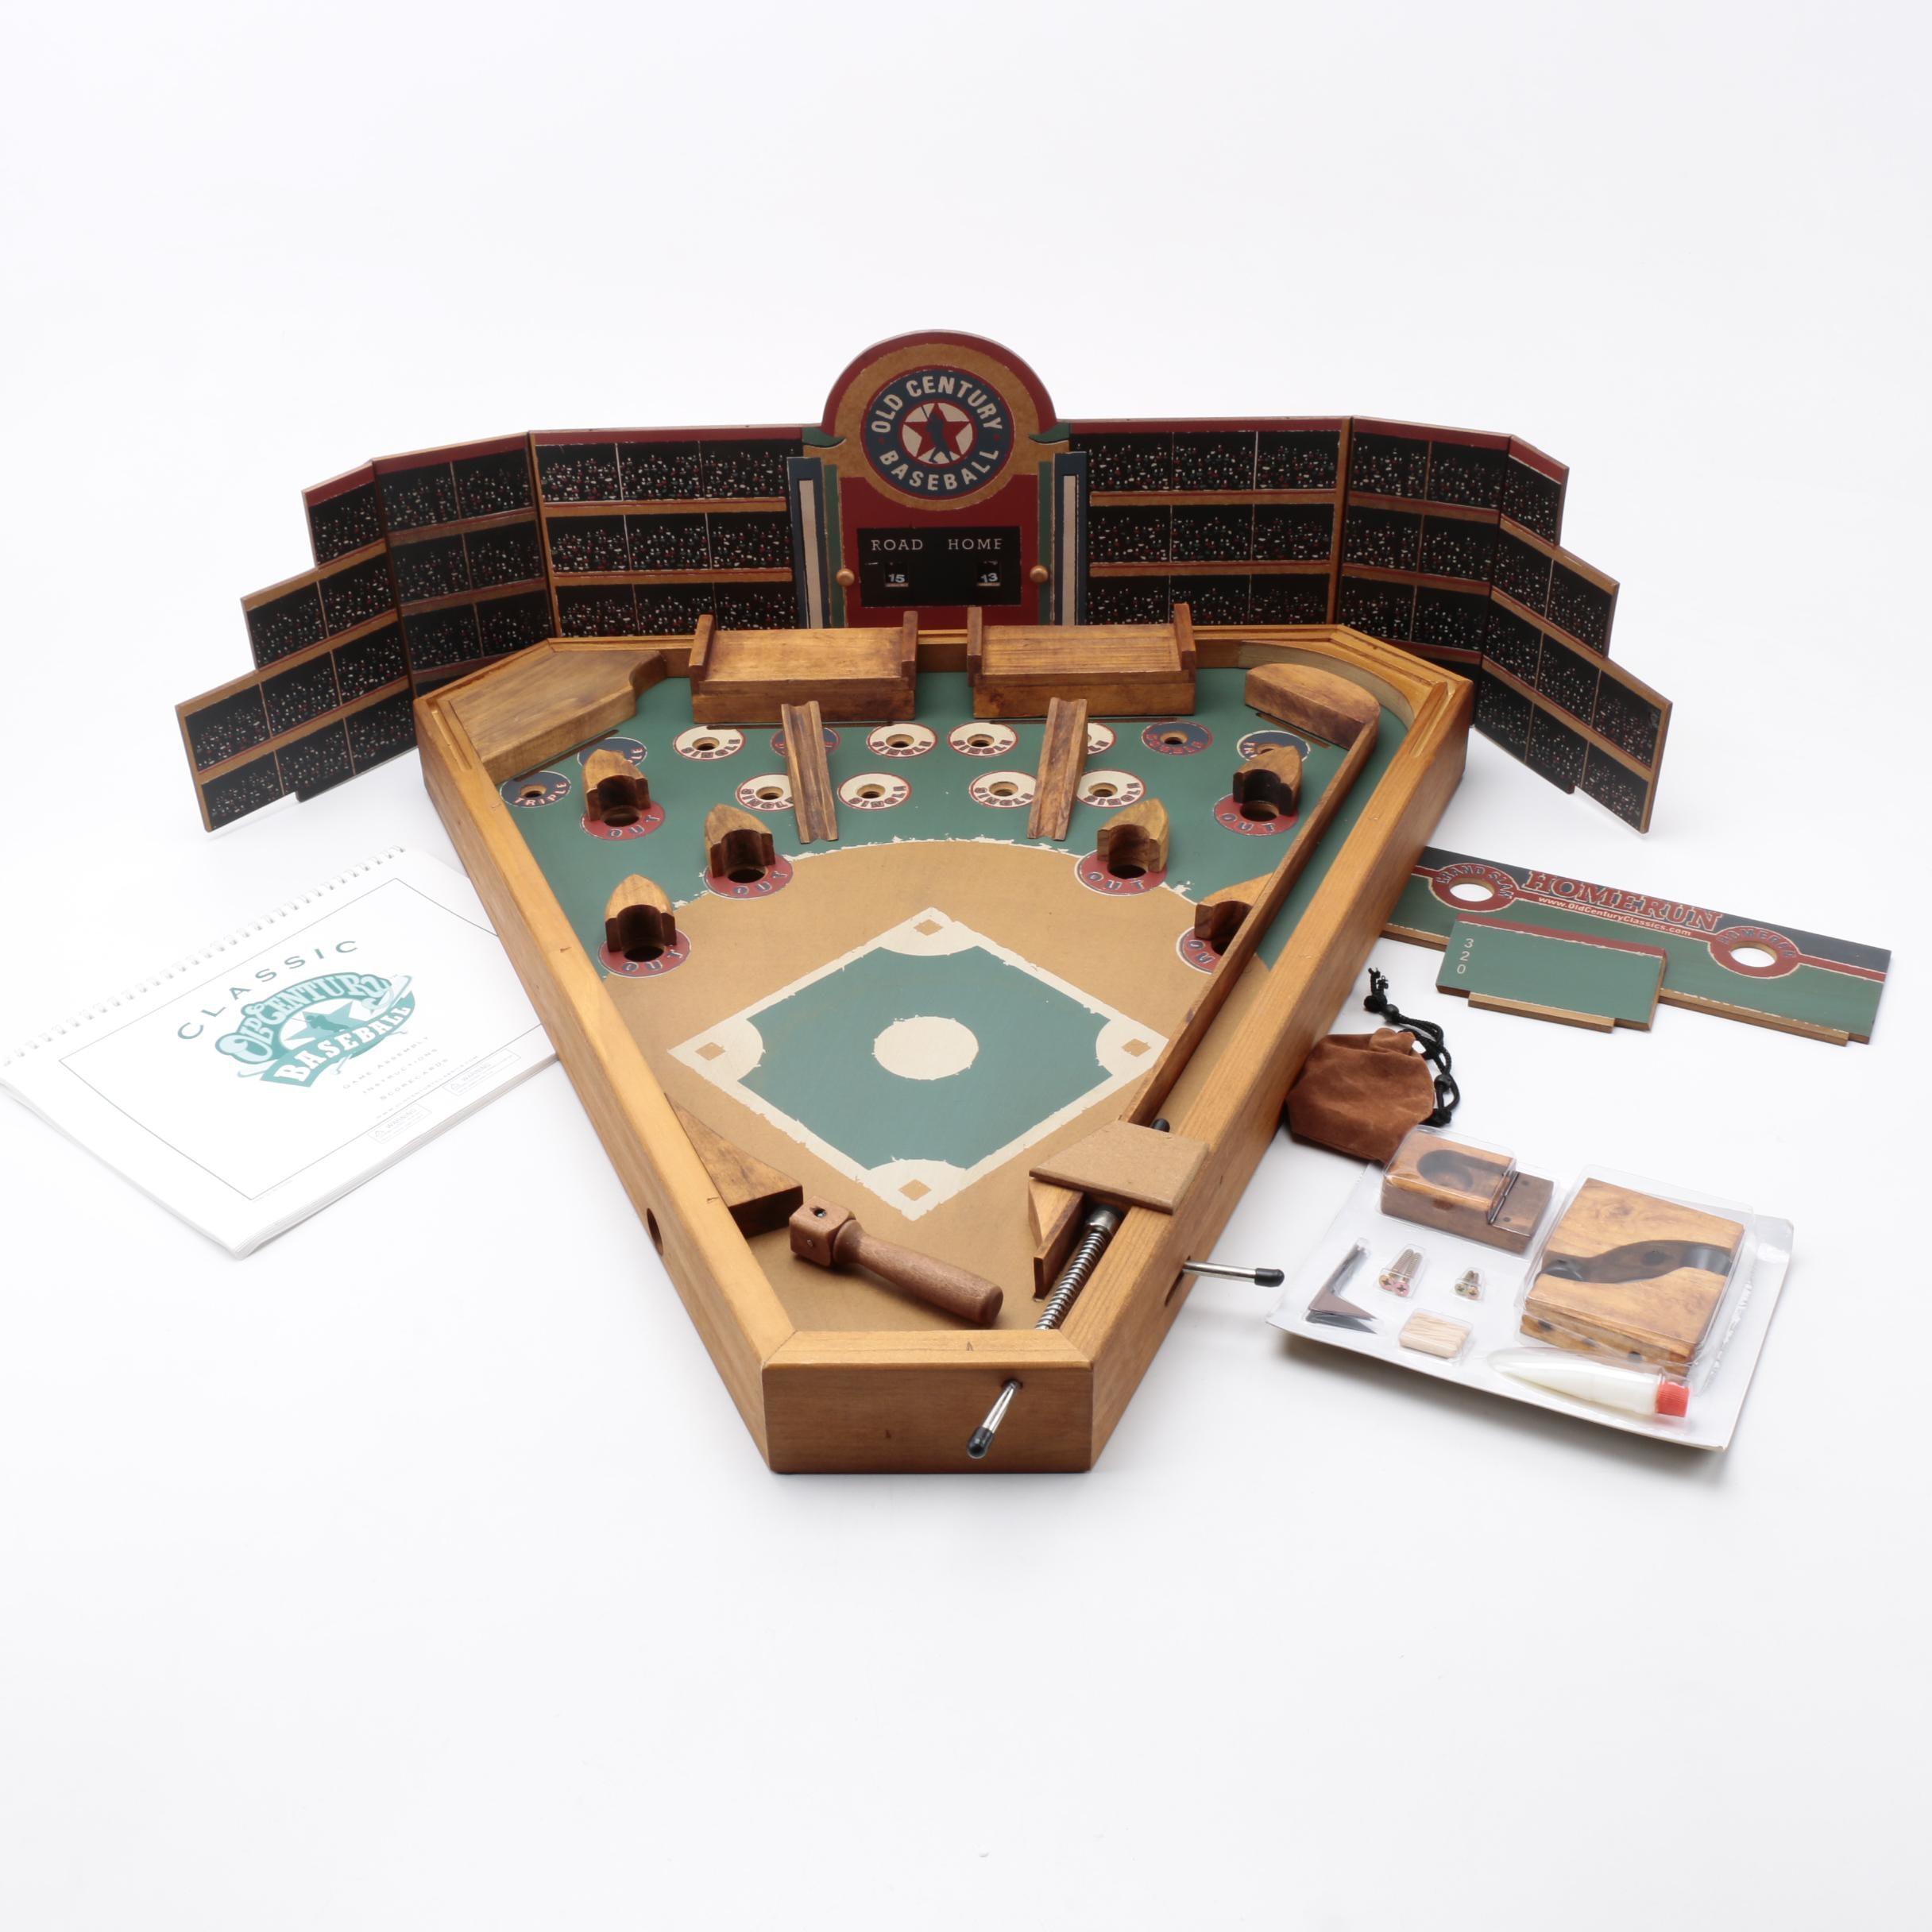 Classic Old Century Baseball Game